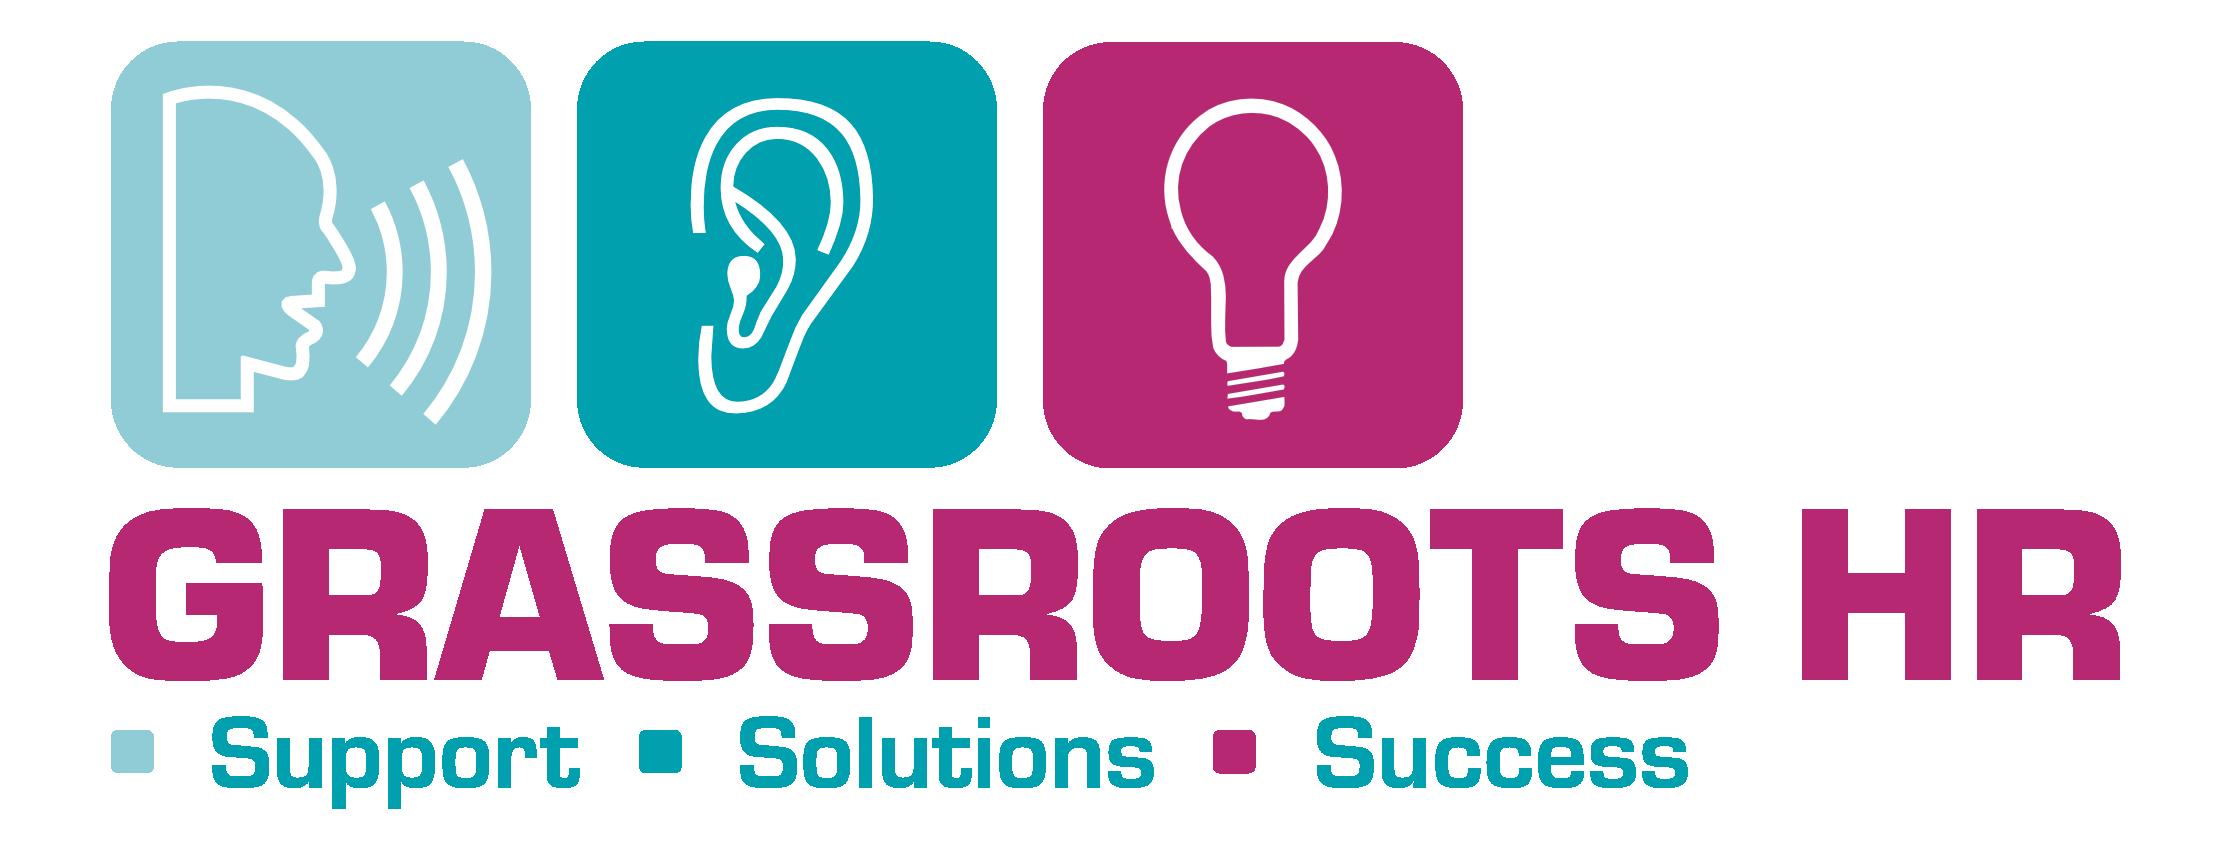 Grassroots HR